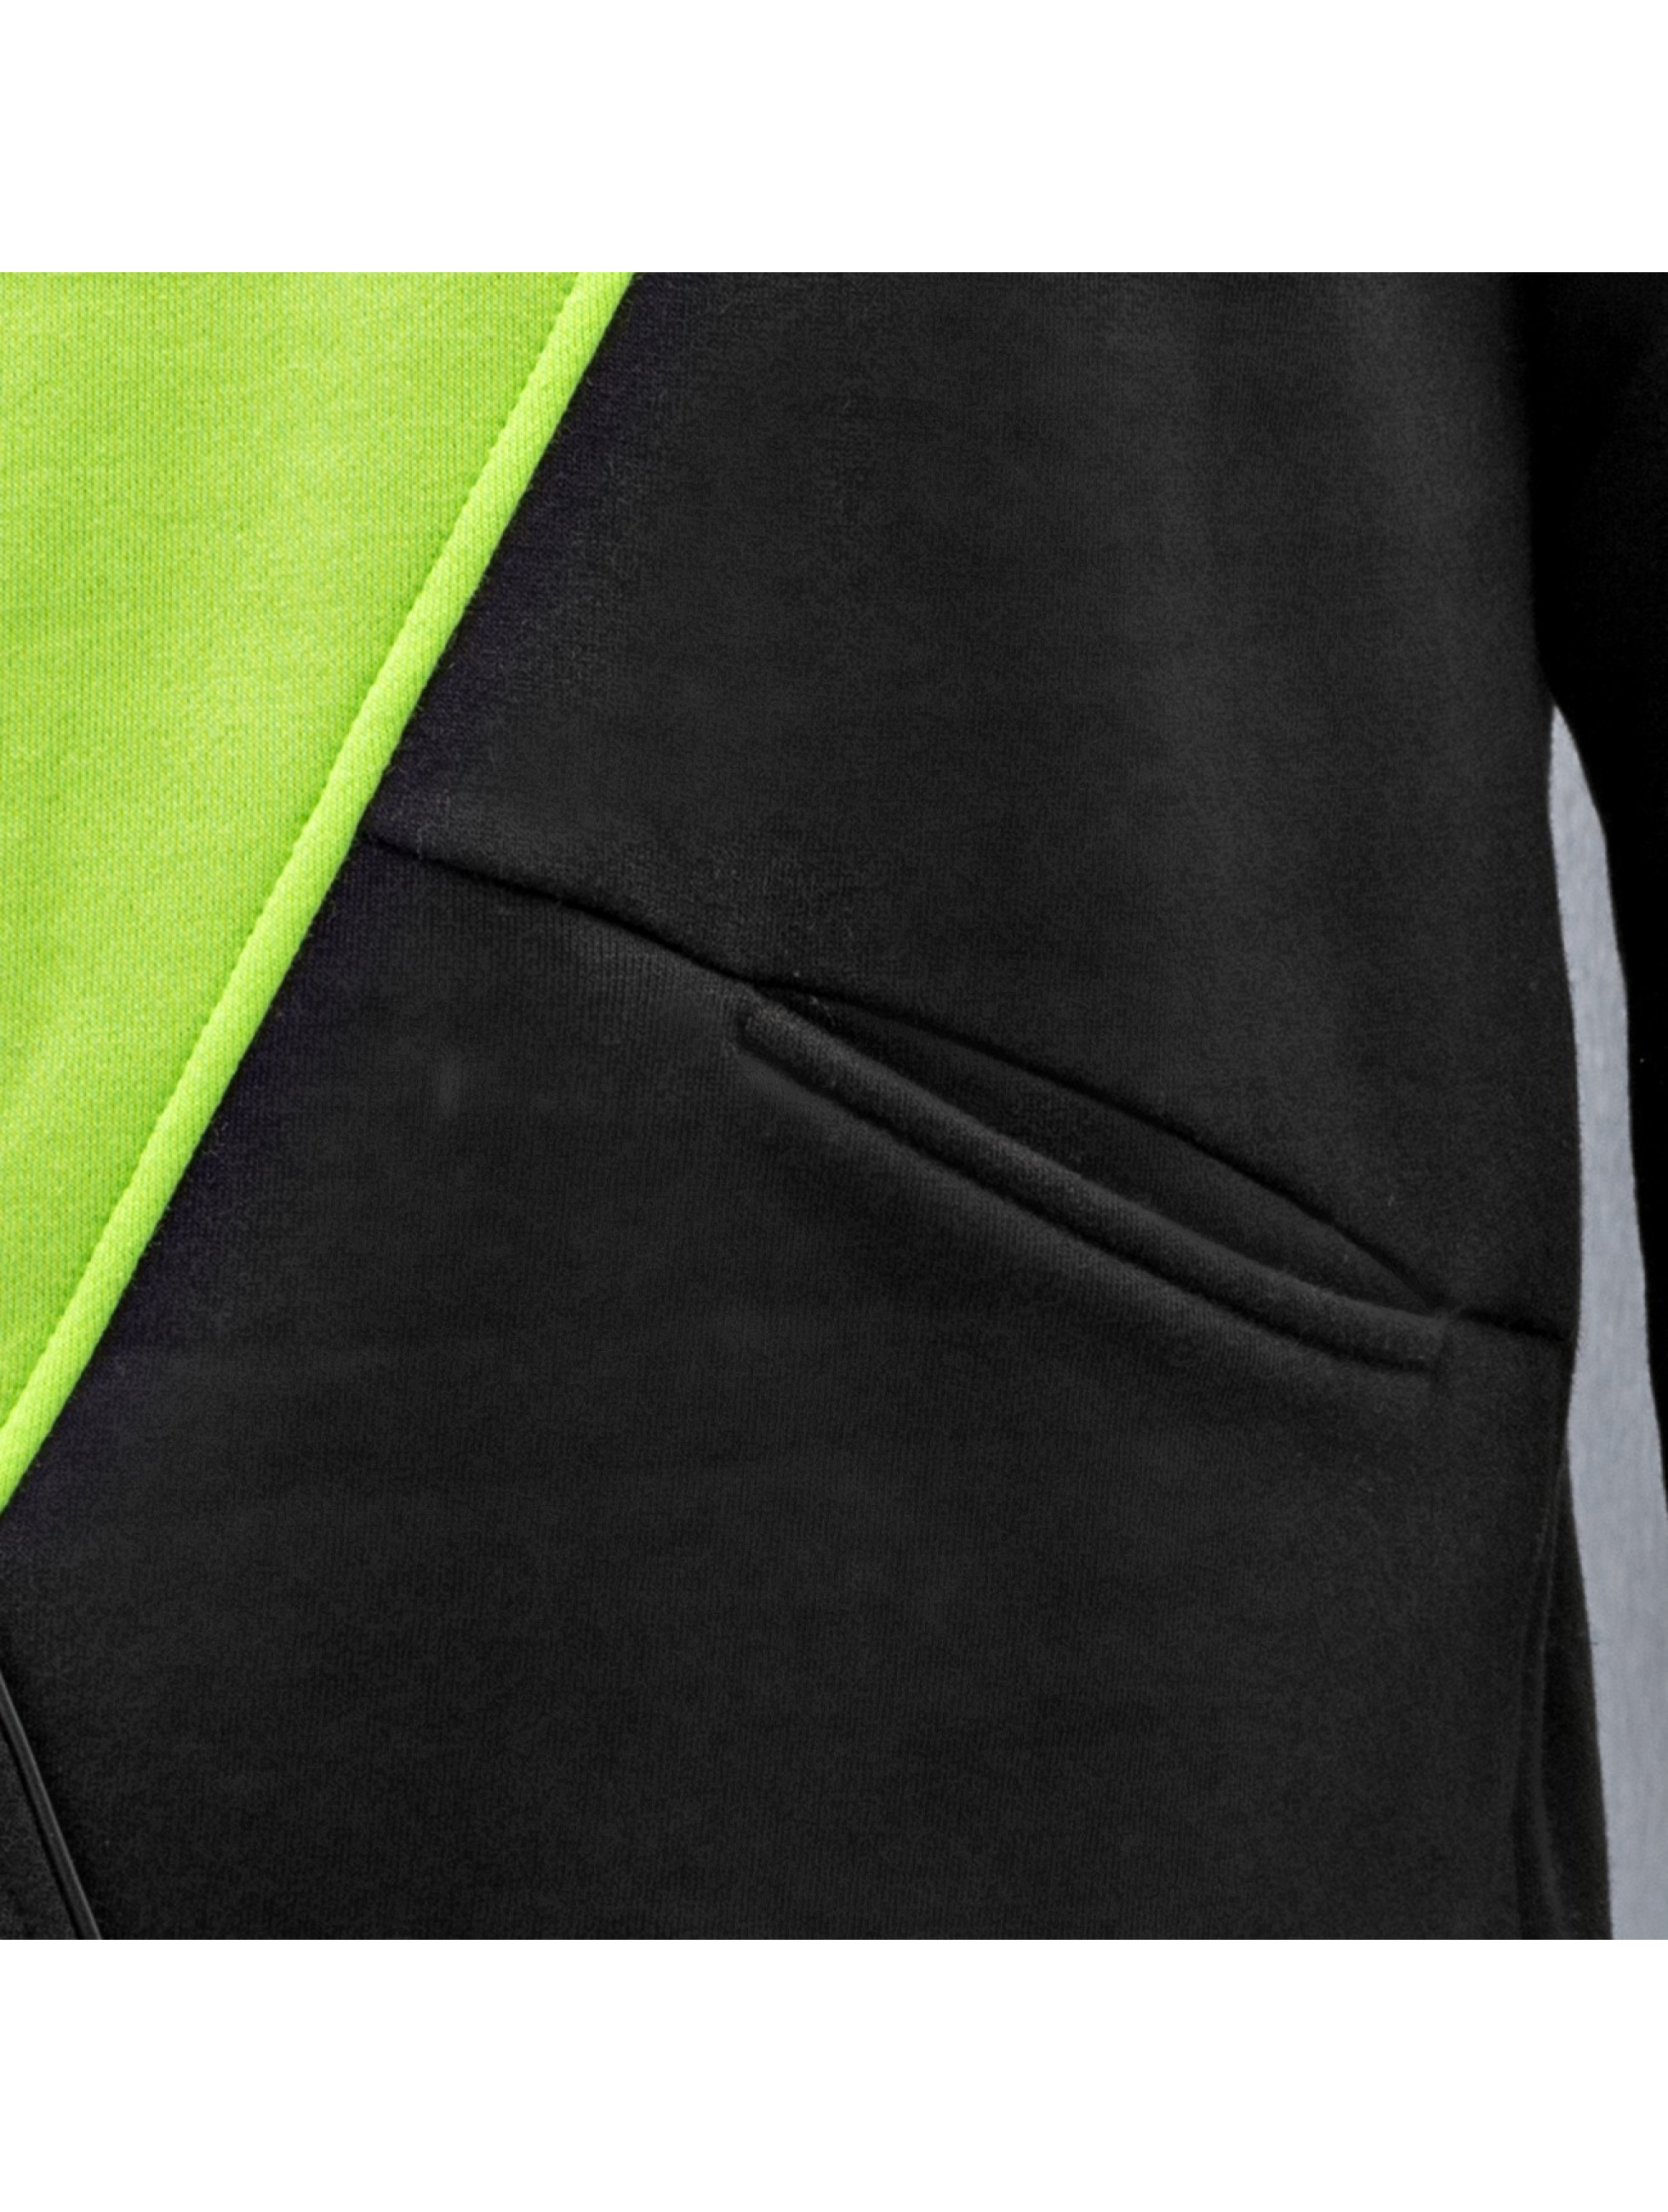 Just Rhyse Hoody Triangle groen